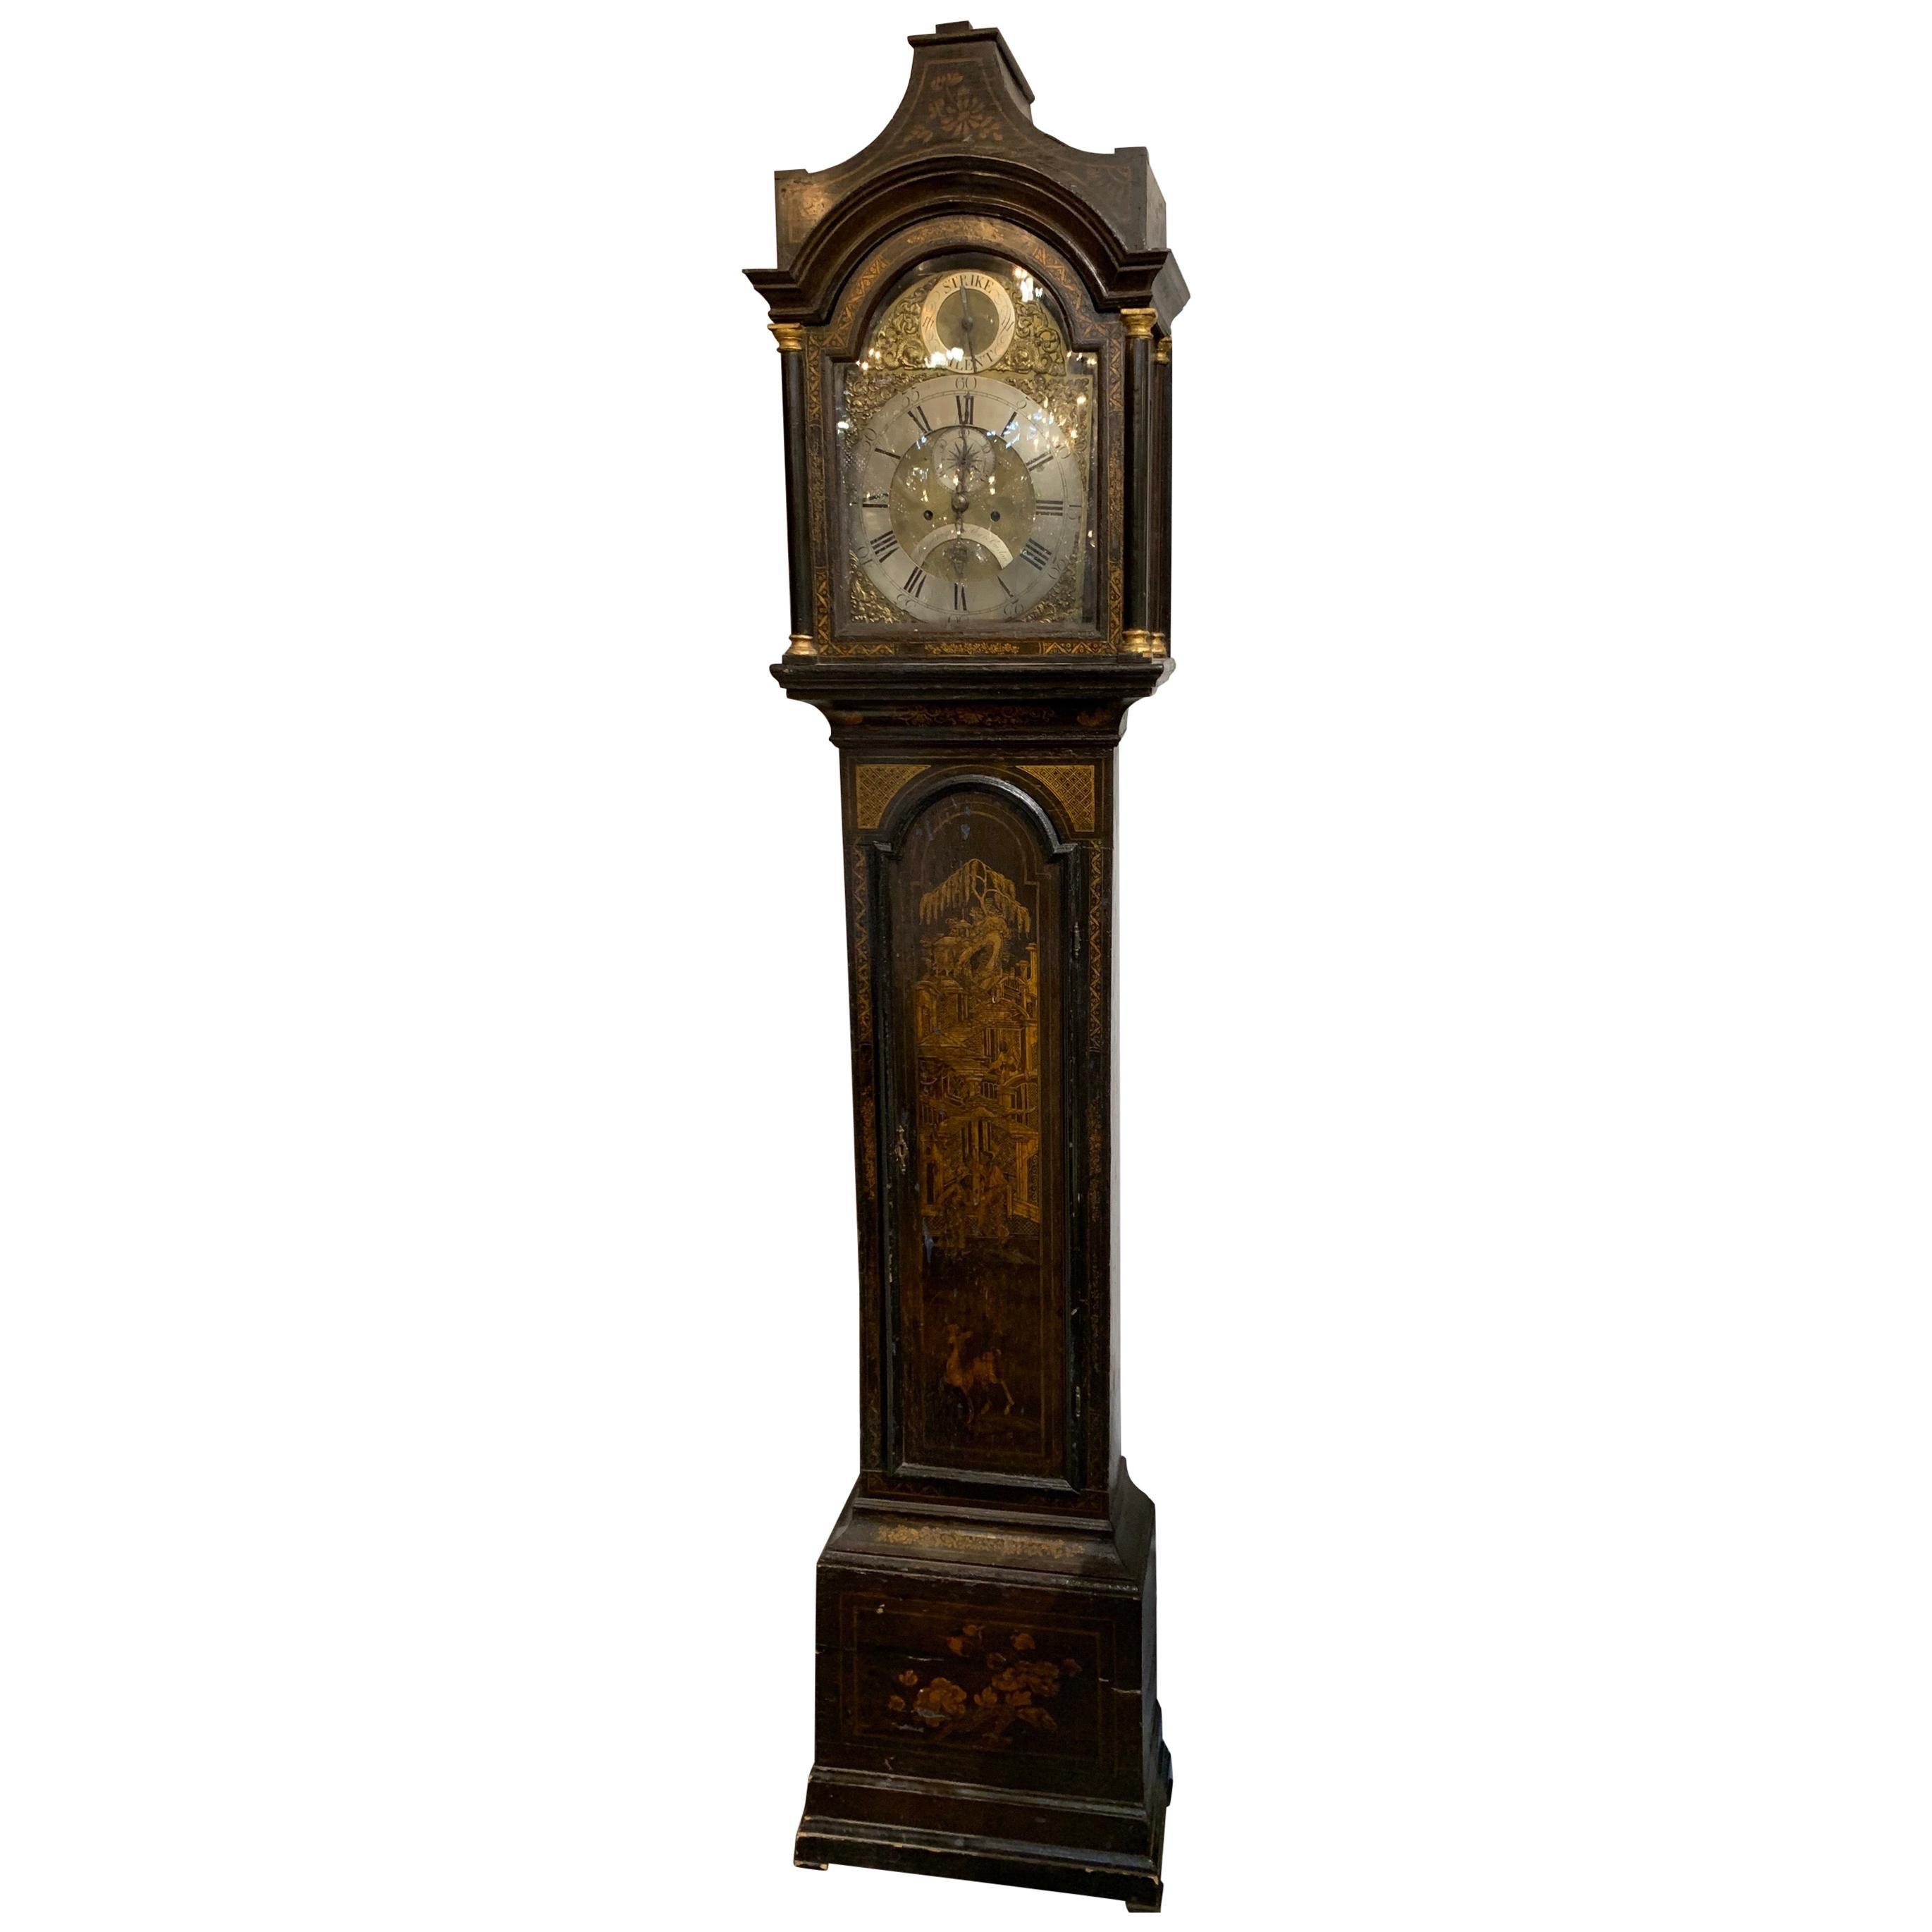 19th Century English Chinoiserie Tall Case Clock